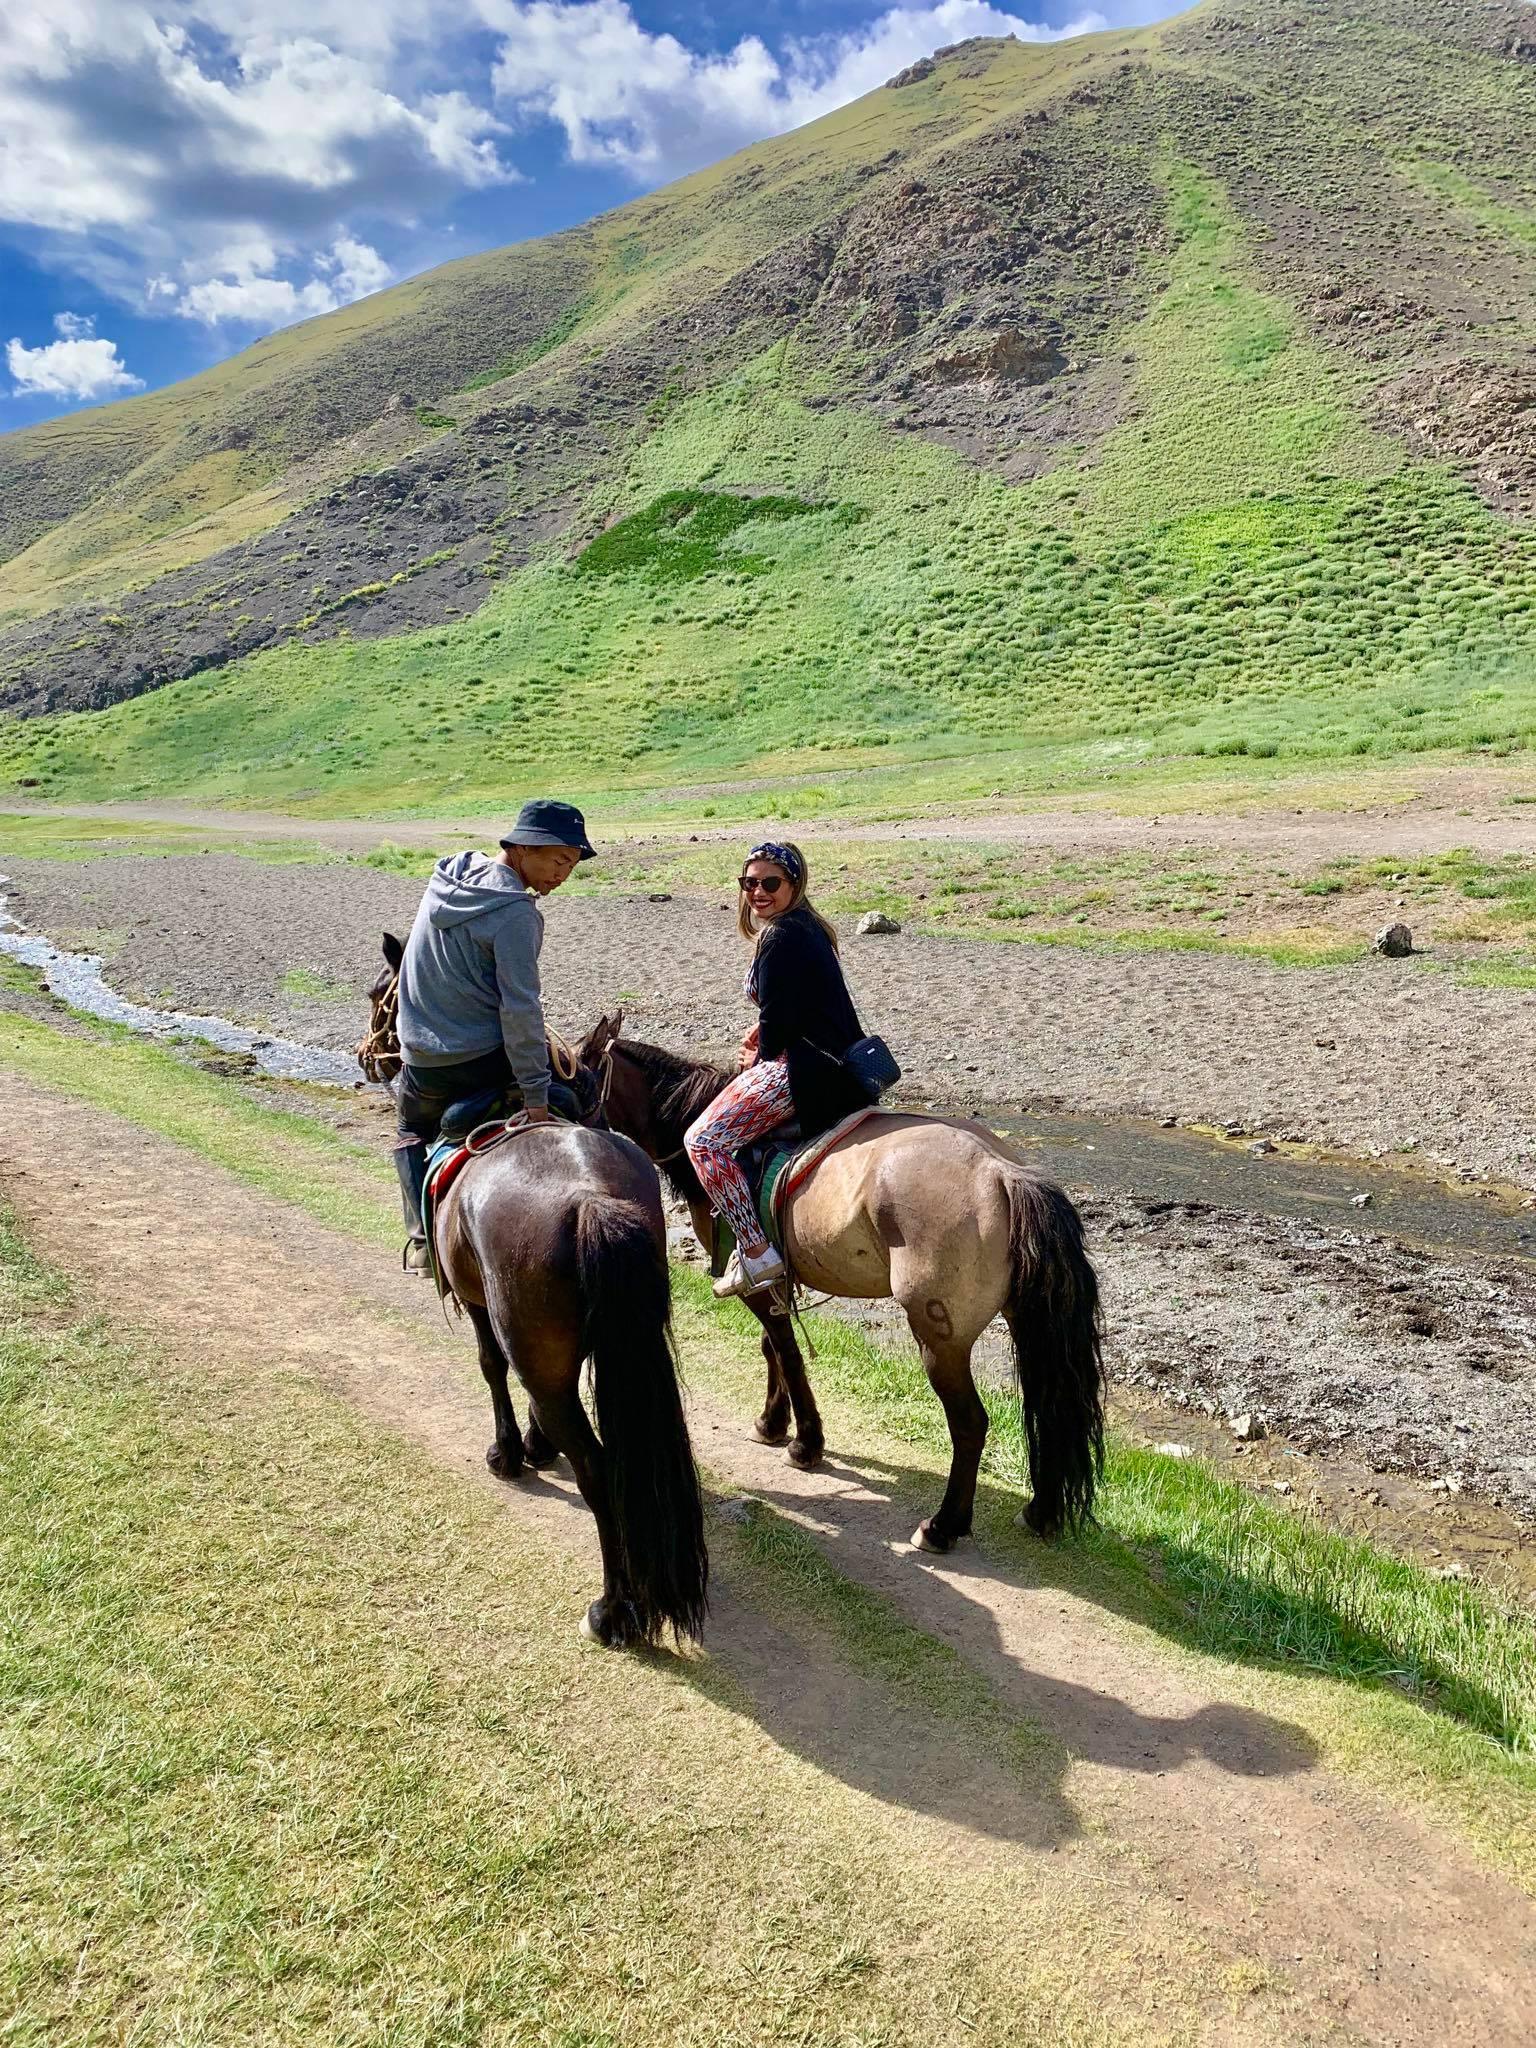 Kach Solo Travels in 2019 Horseback riding trip to the Gobi Gurvan Saikhan National Park2.jpg